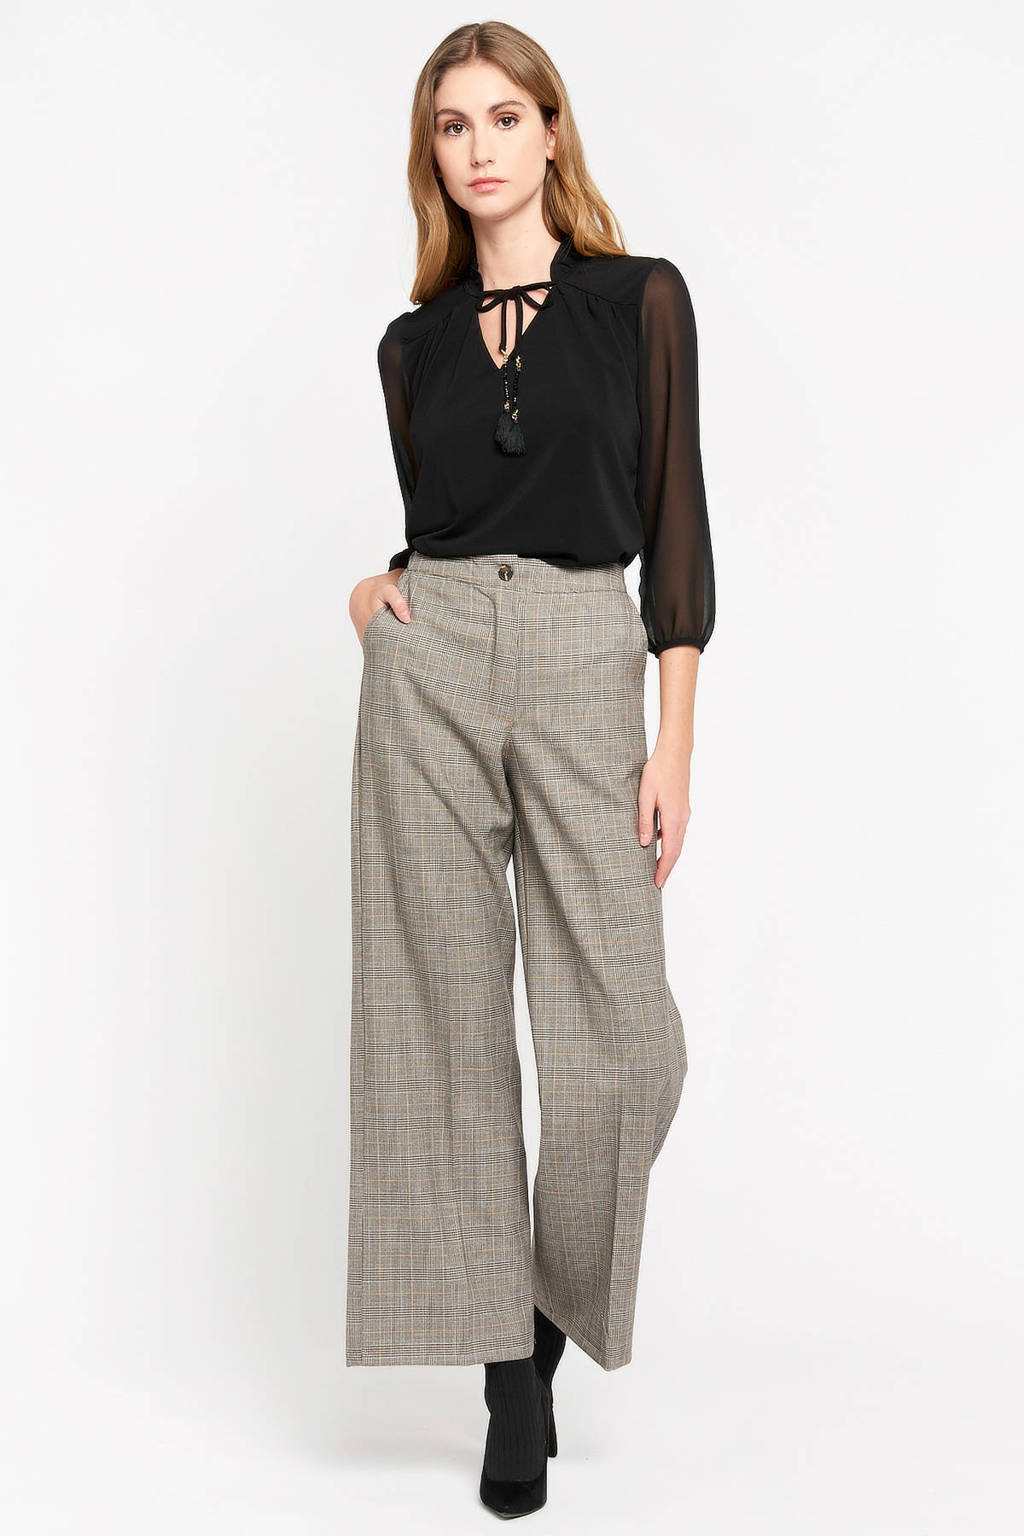 LOLALIZA geruite high waist loose fit broek beige, Beige